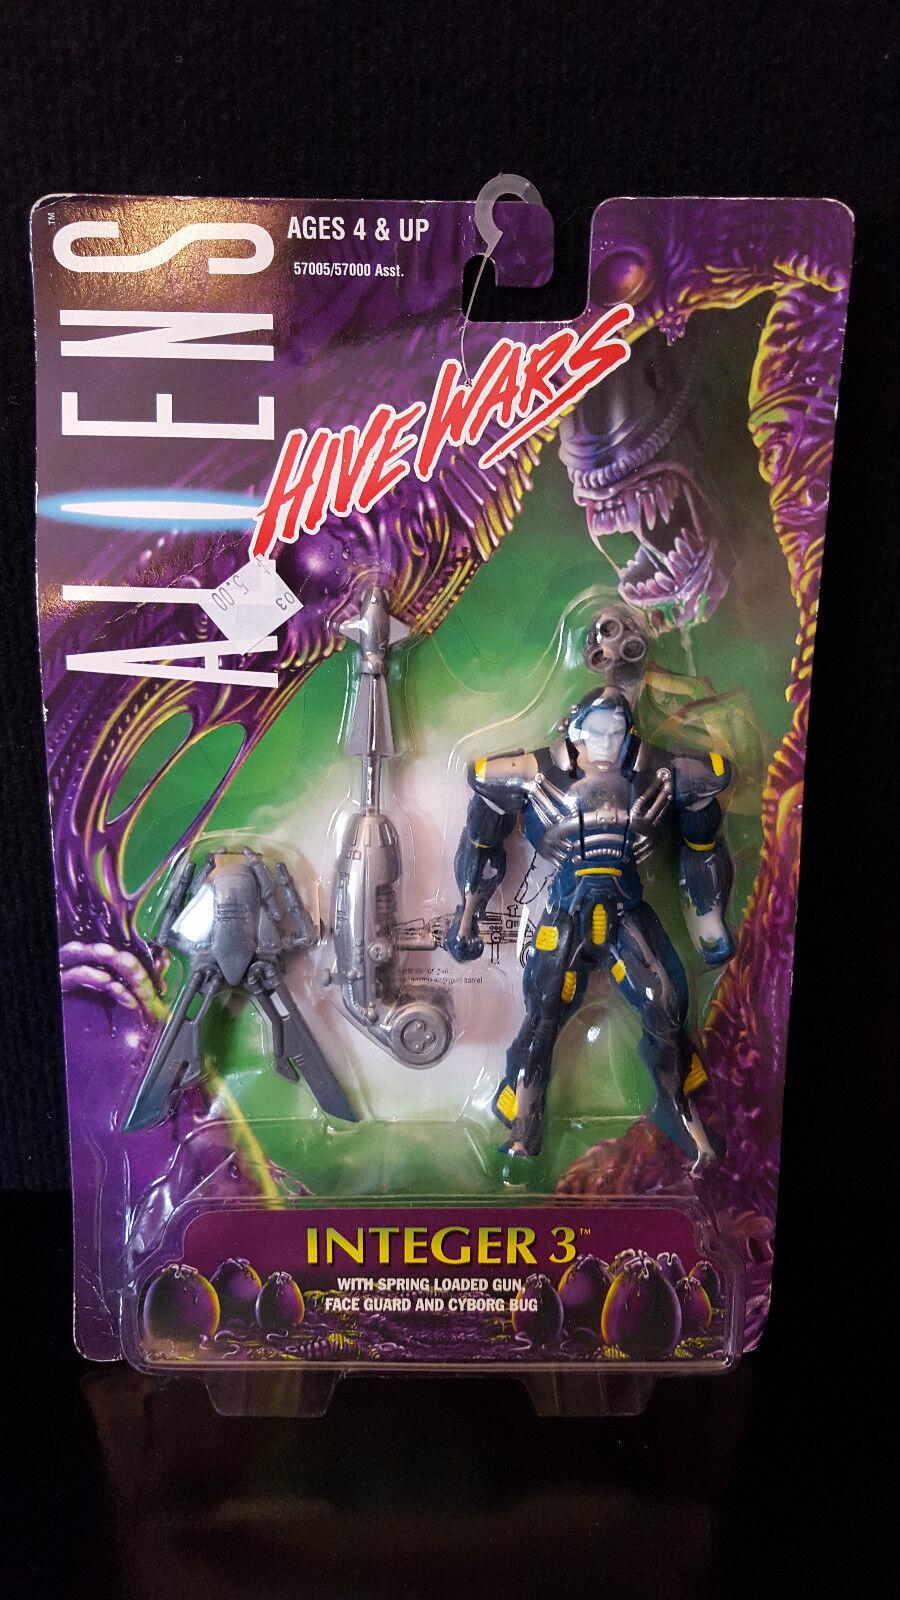 1998 Kenner Aliens Vs. Predator AVP Hive Wars Integer 3 Cyborg 5  Action Figure